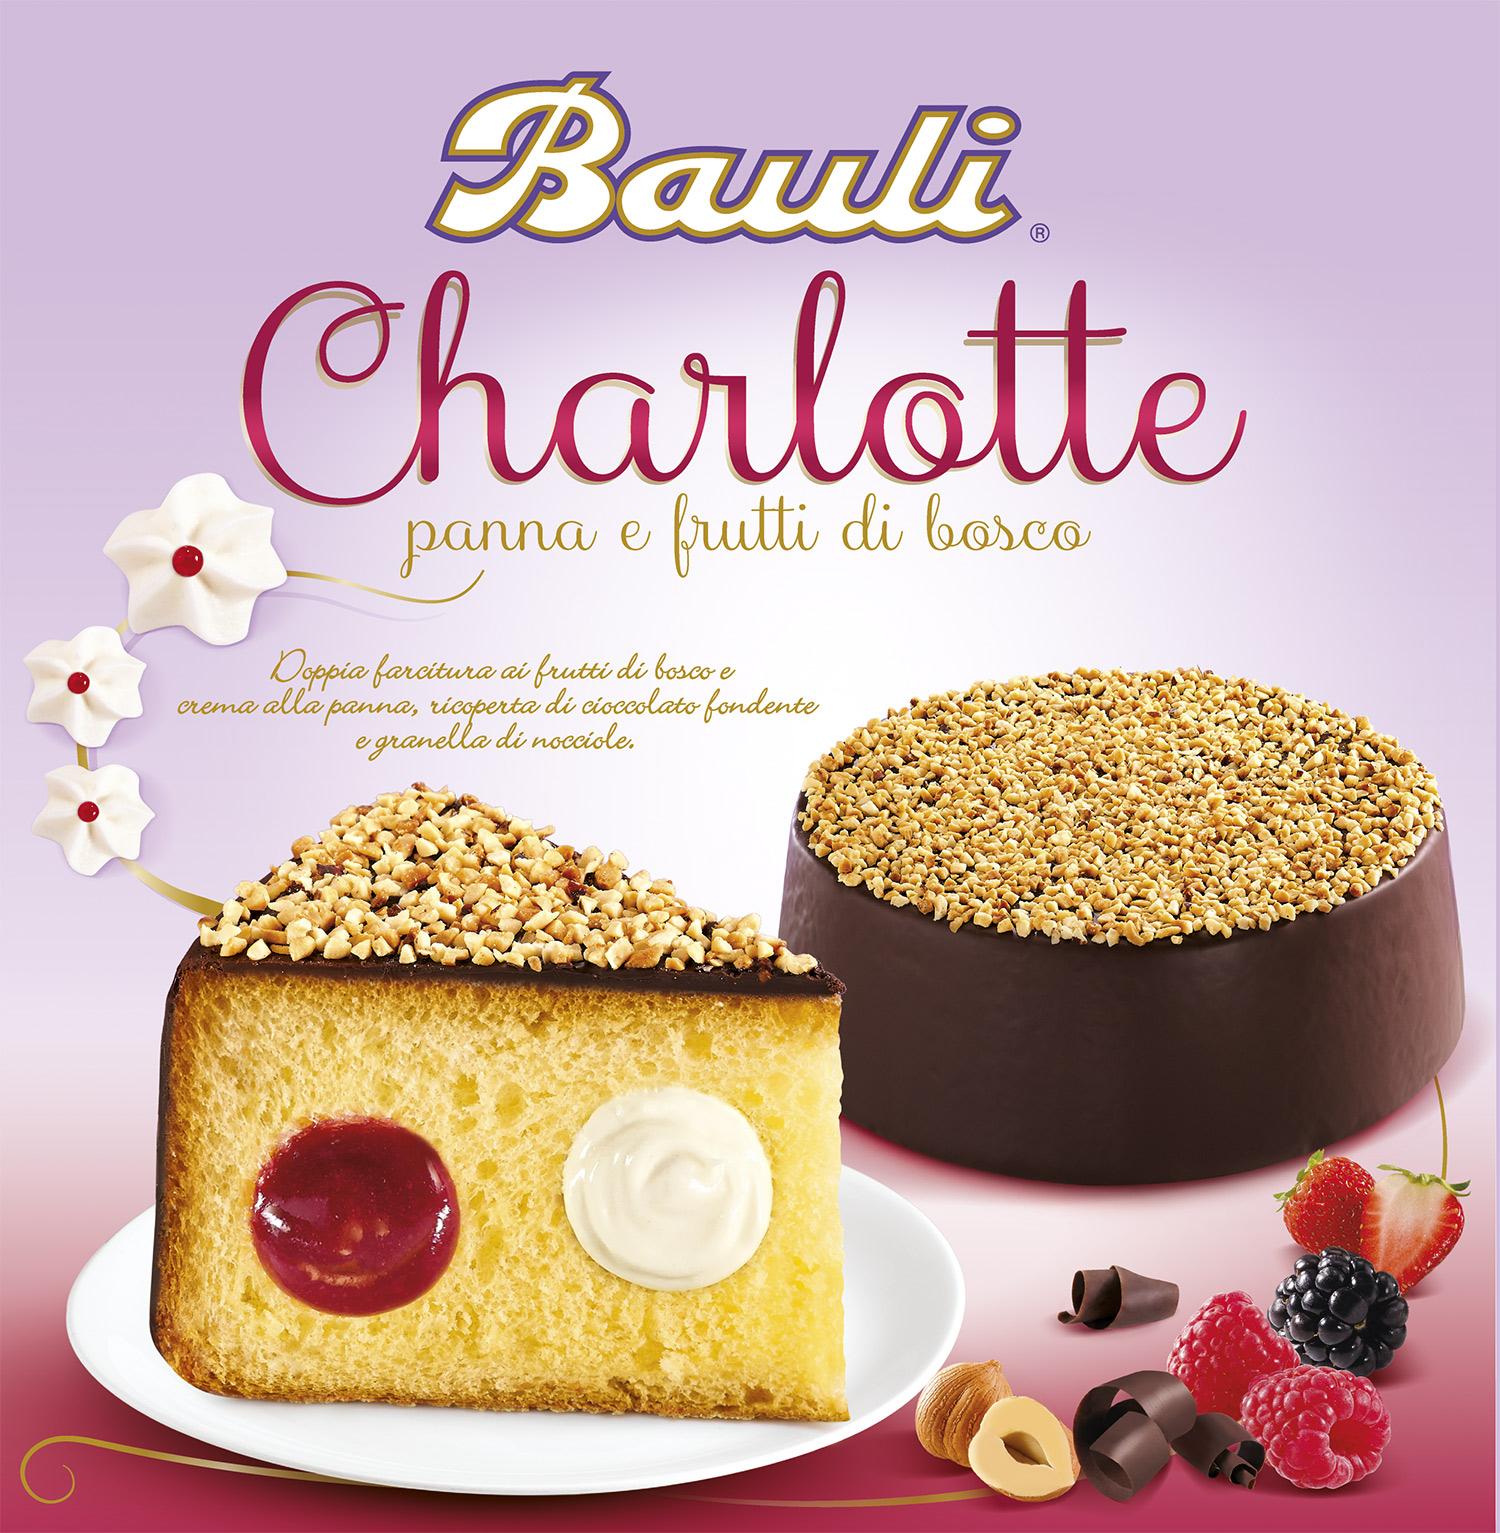 EXE_BAULI_Charlotte-01